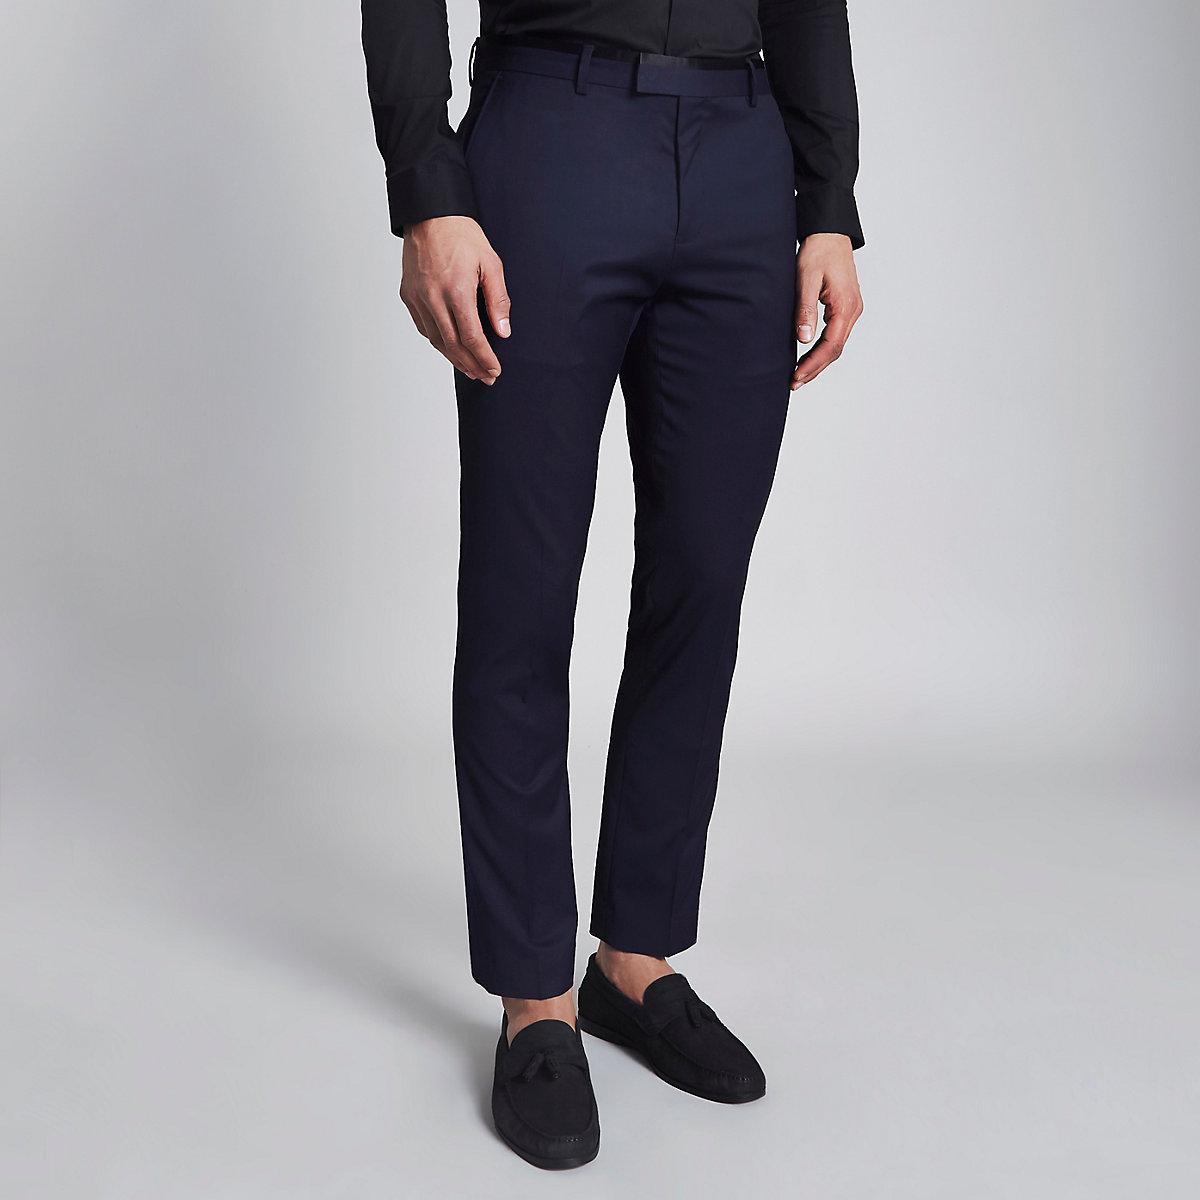 Navy skinny tuxedo pants